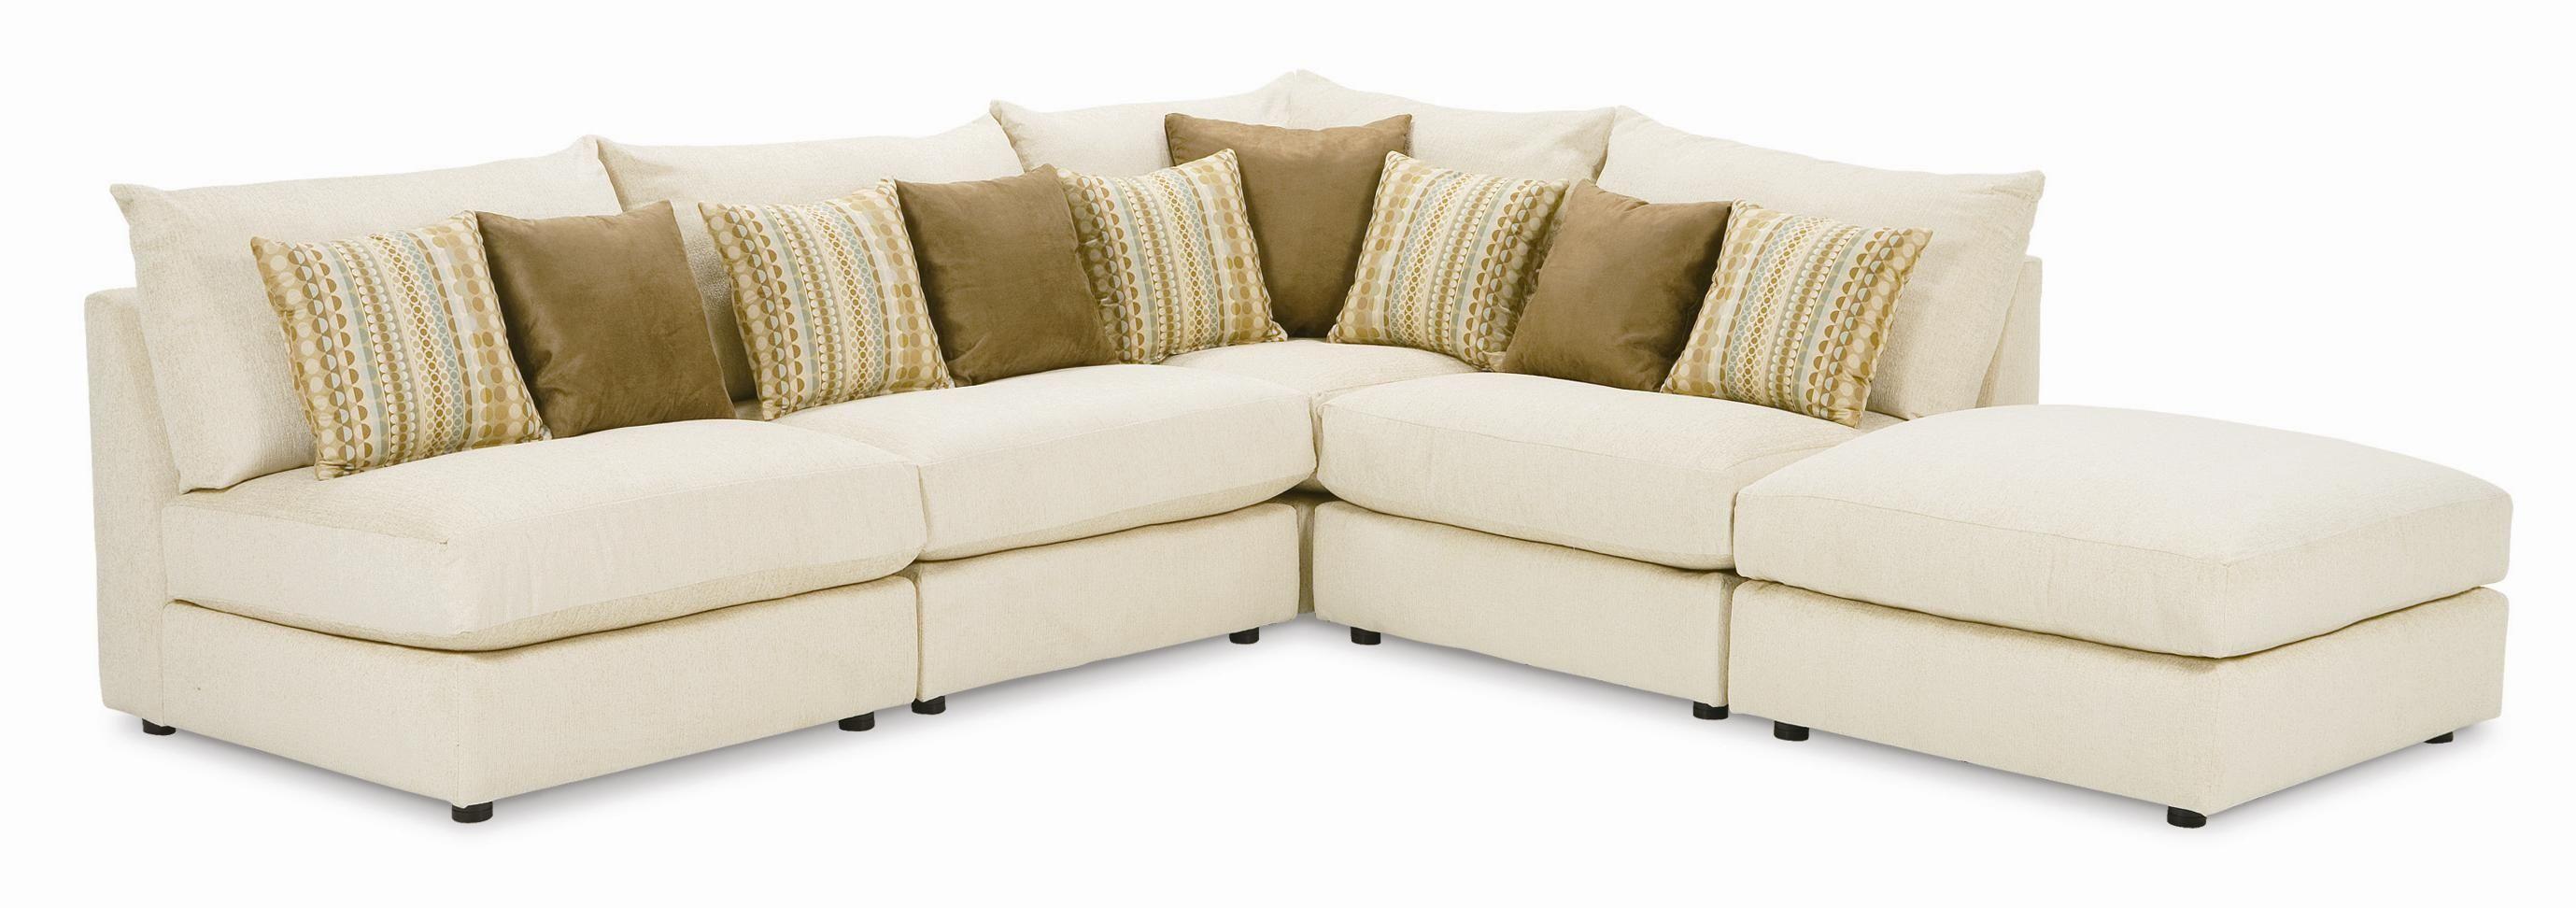 Armless Sectional Sofa Pieces